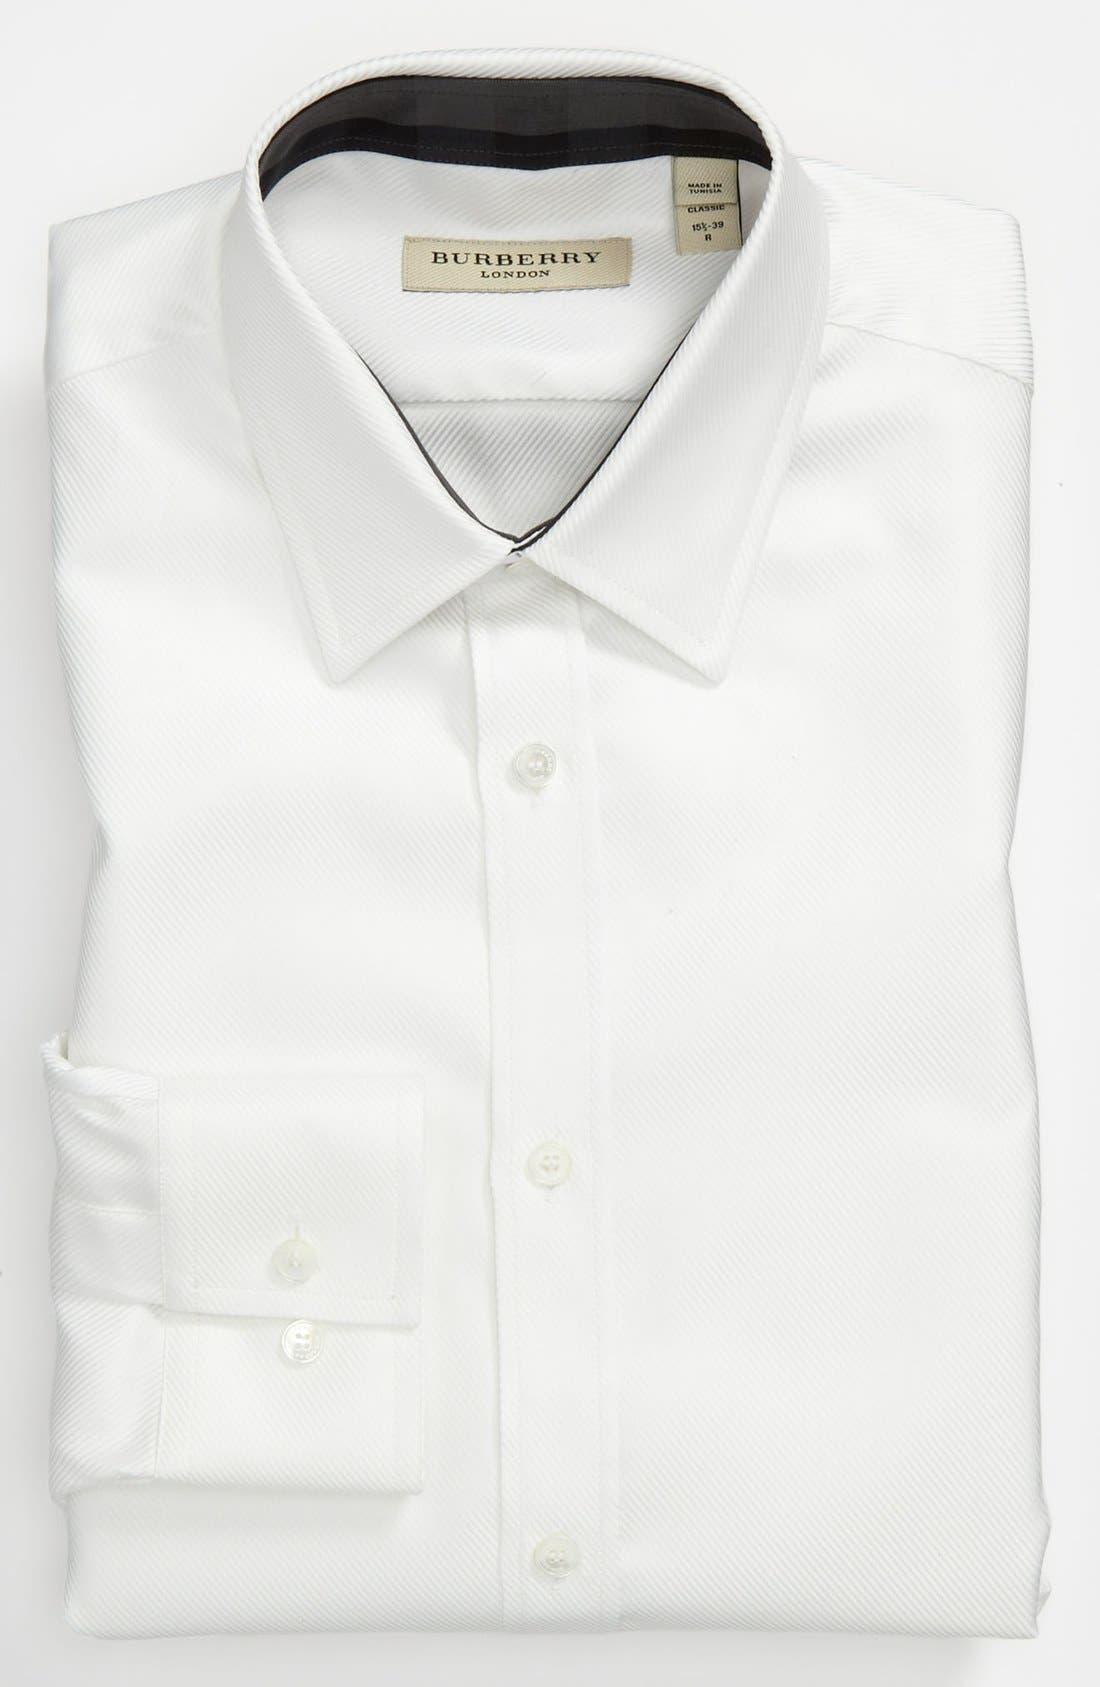 Main Image - Burberry London Regular Fit Dress Shirt